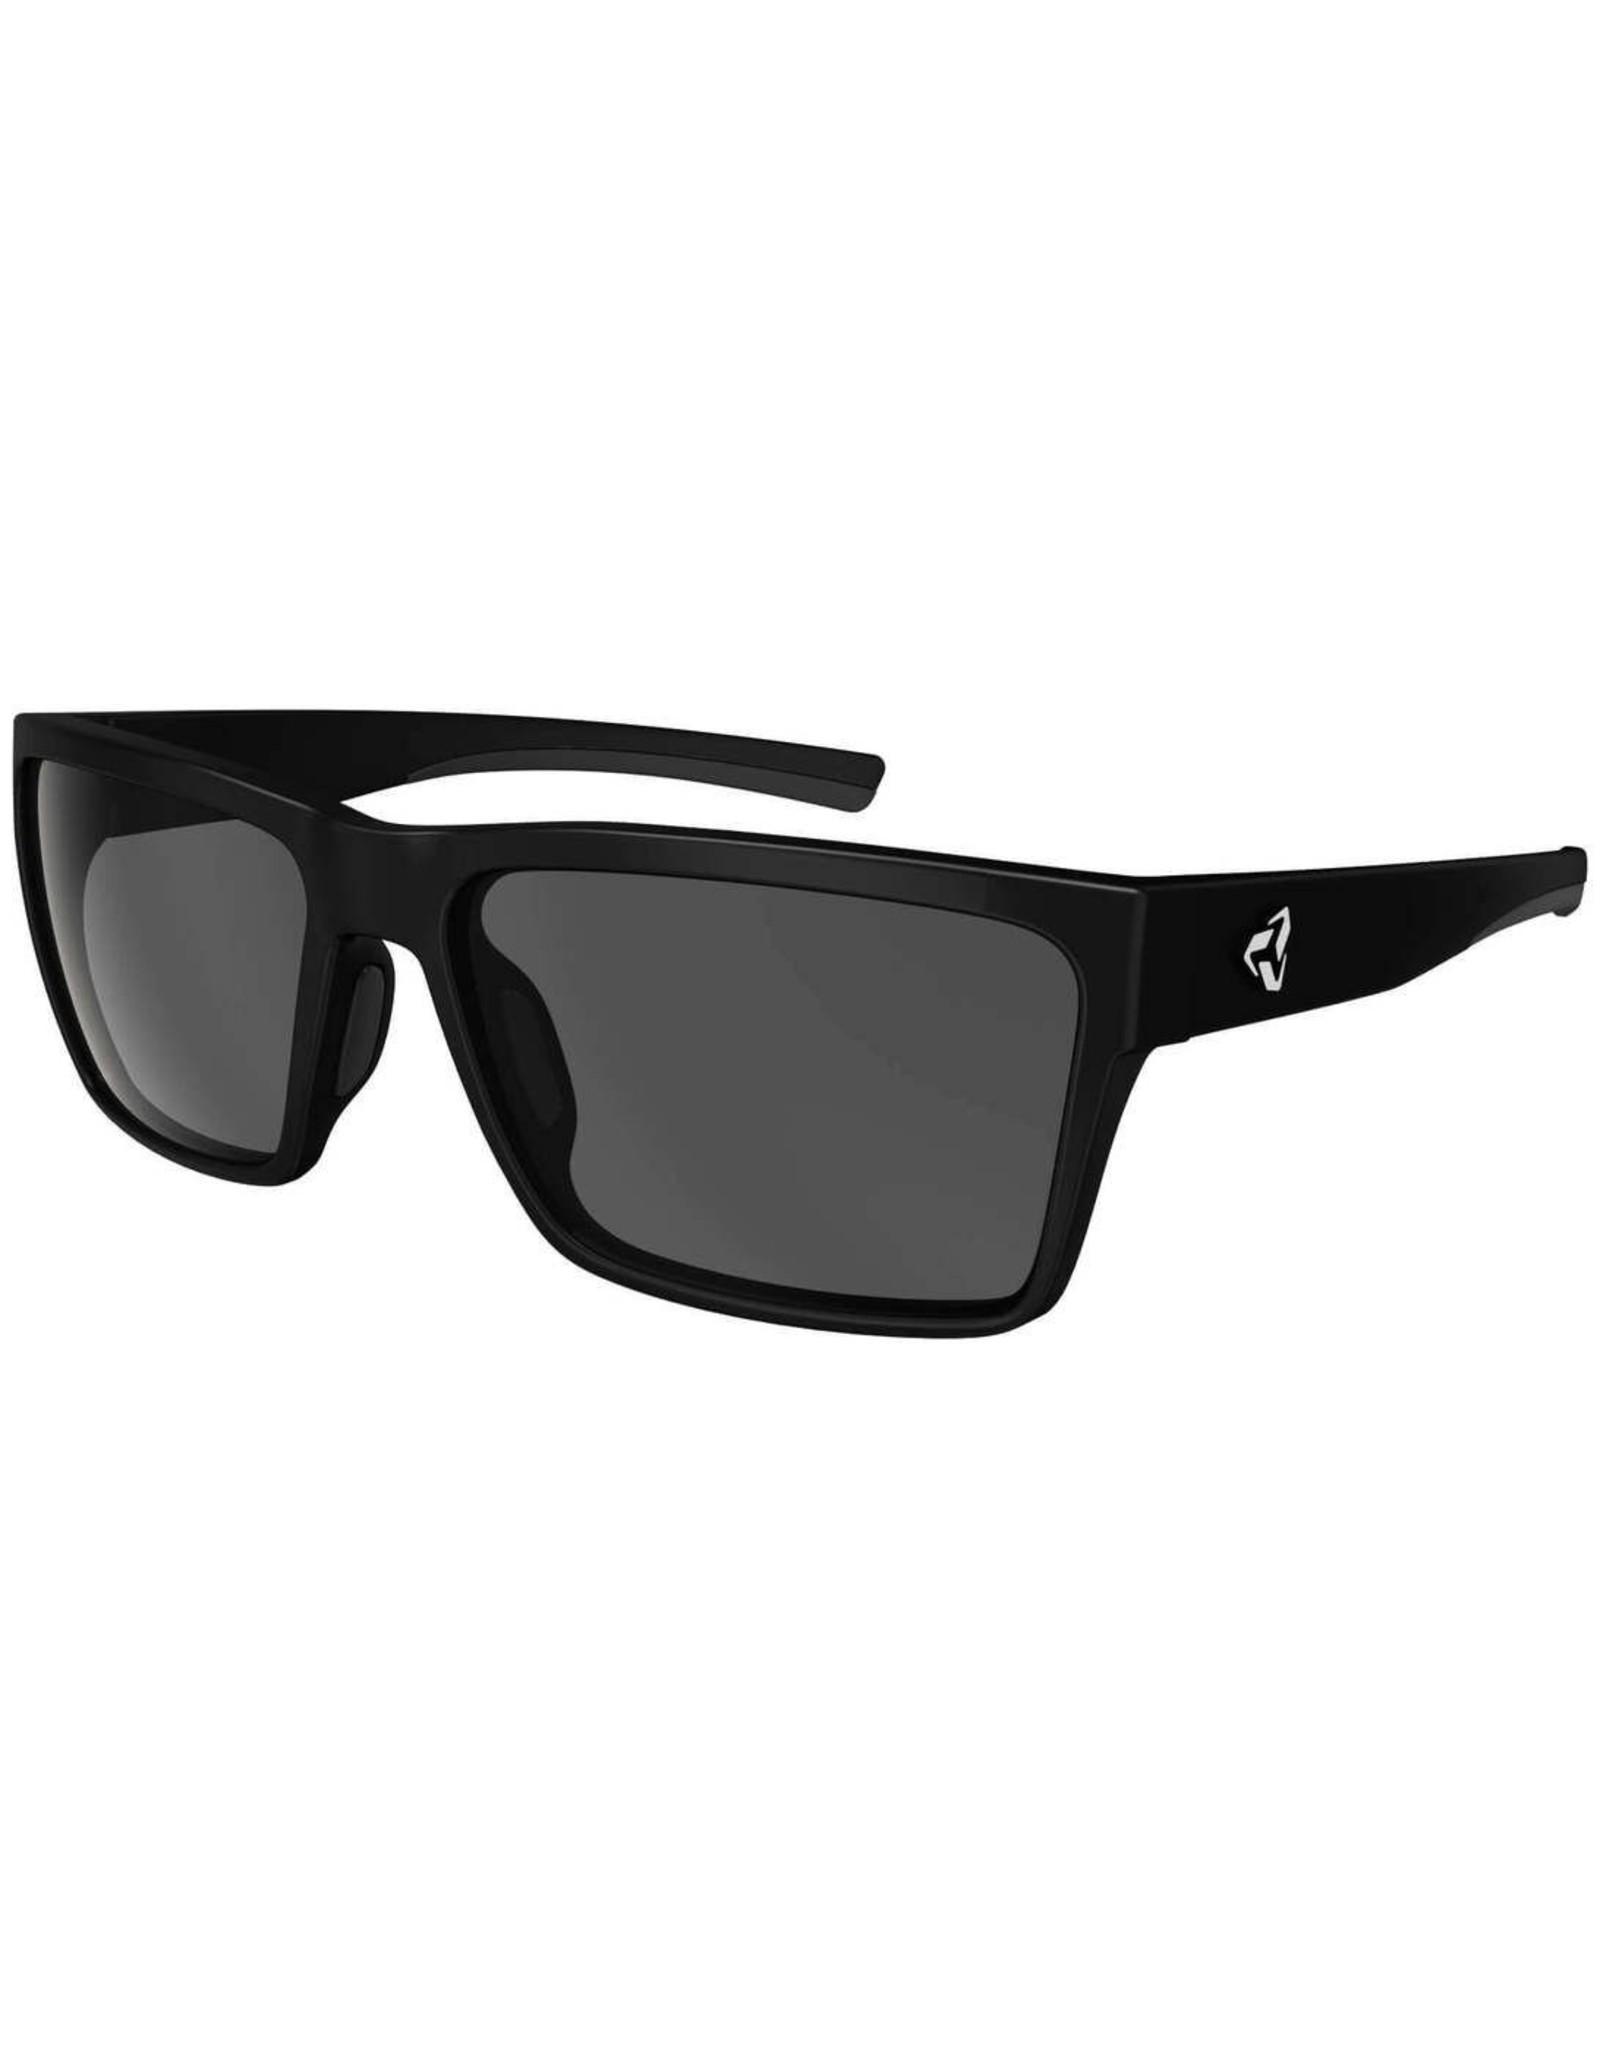 Ryders Eyewear - Nelson Polar Black Matte/Grey Lens